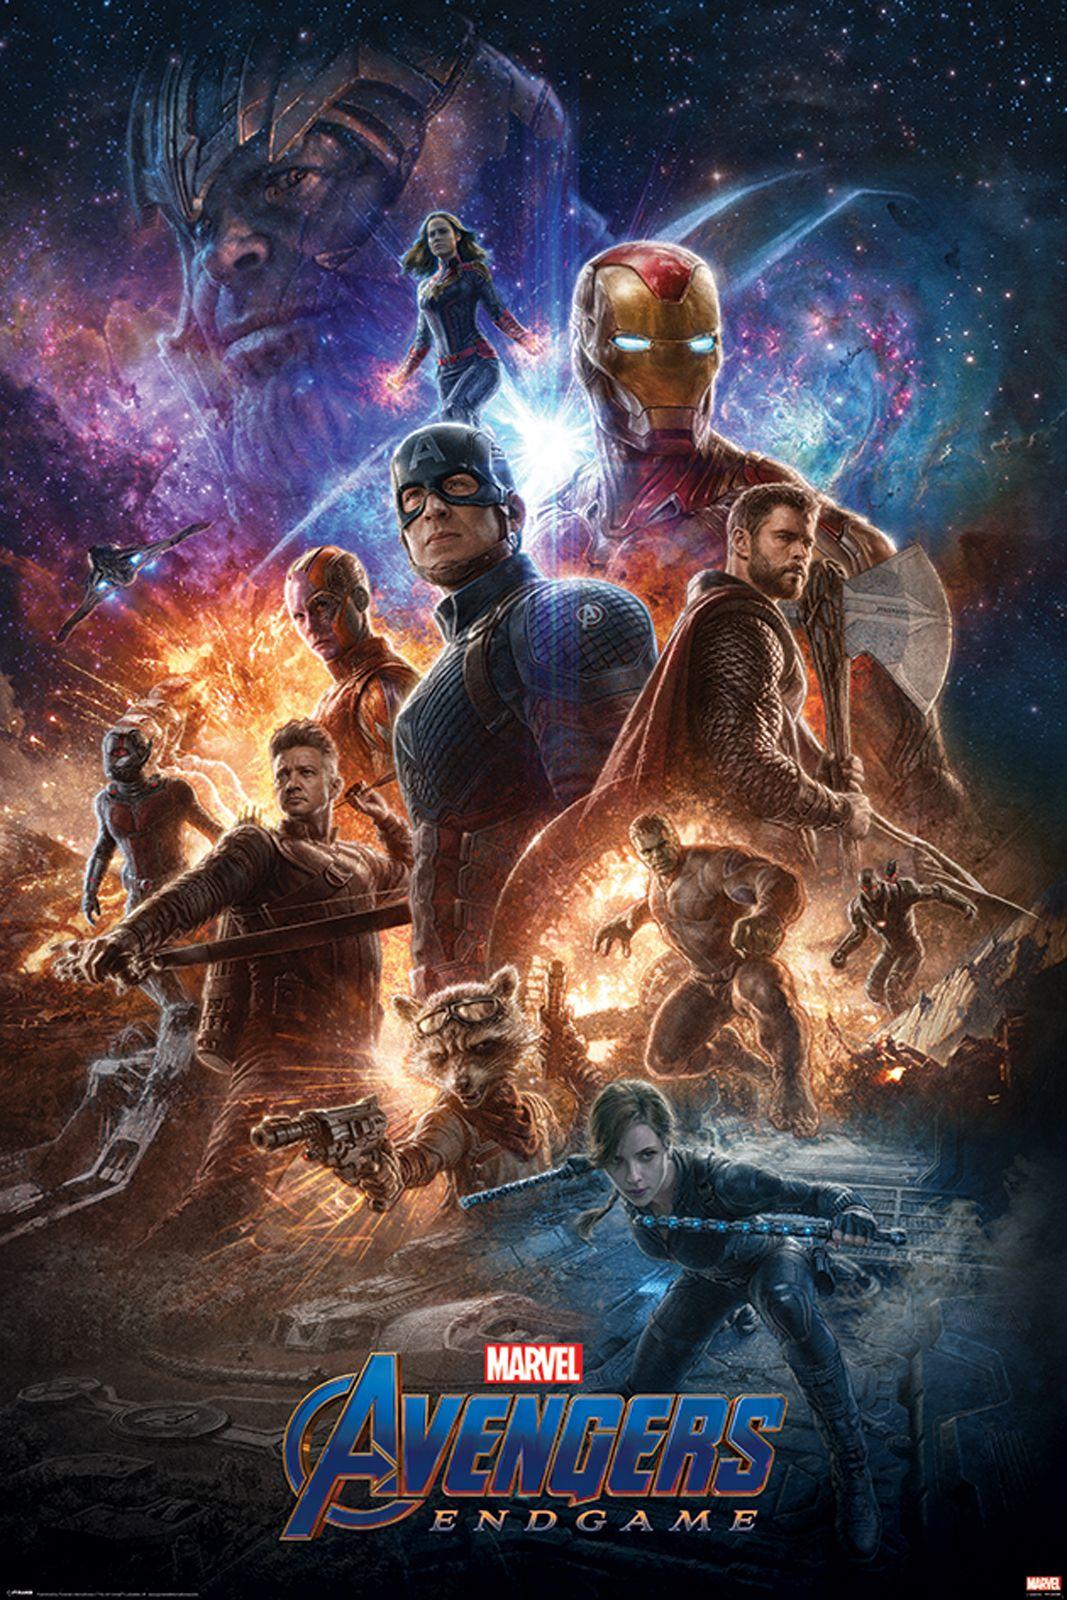 Poster z bohaterami Avengers: Endgame